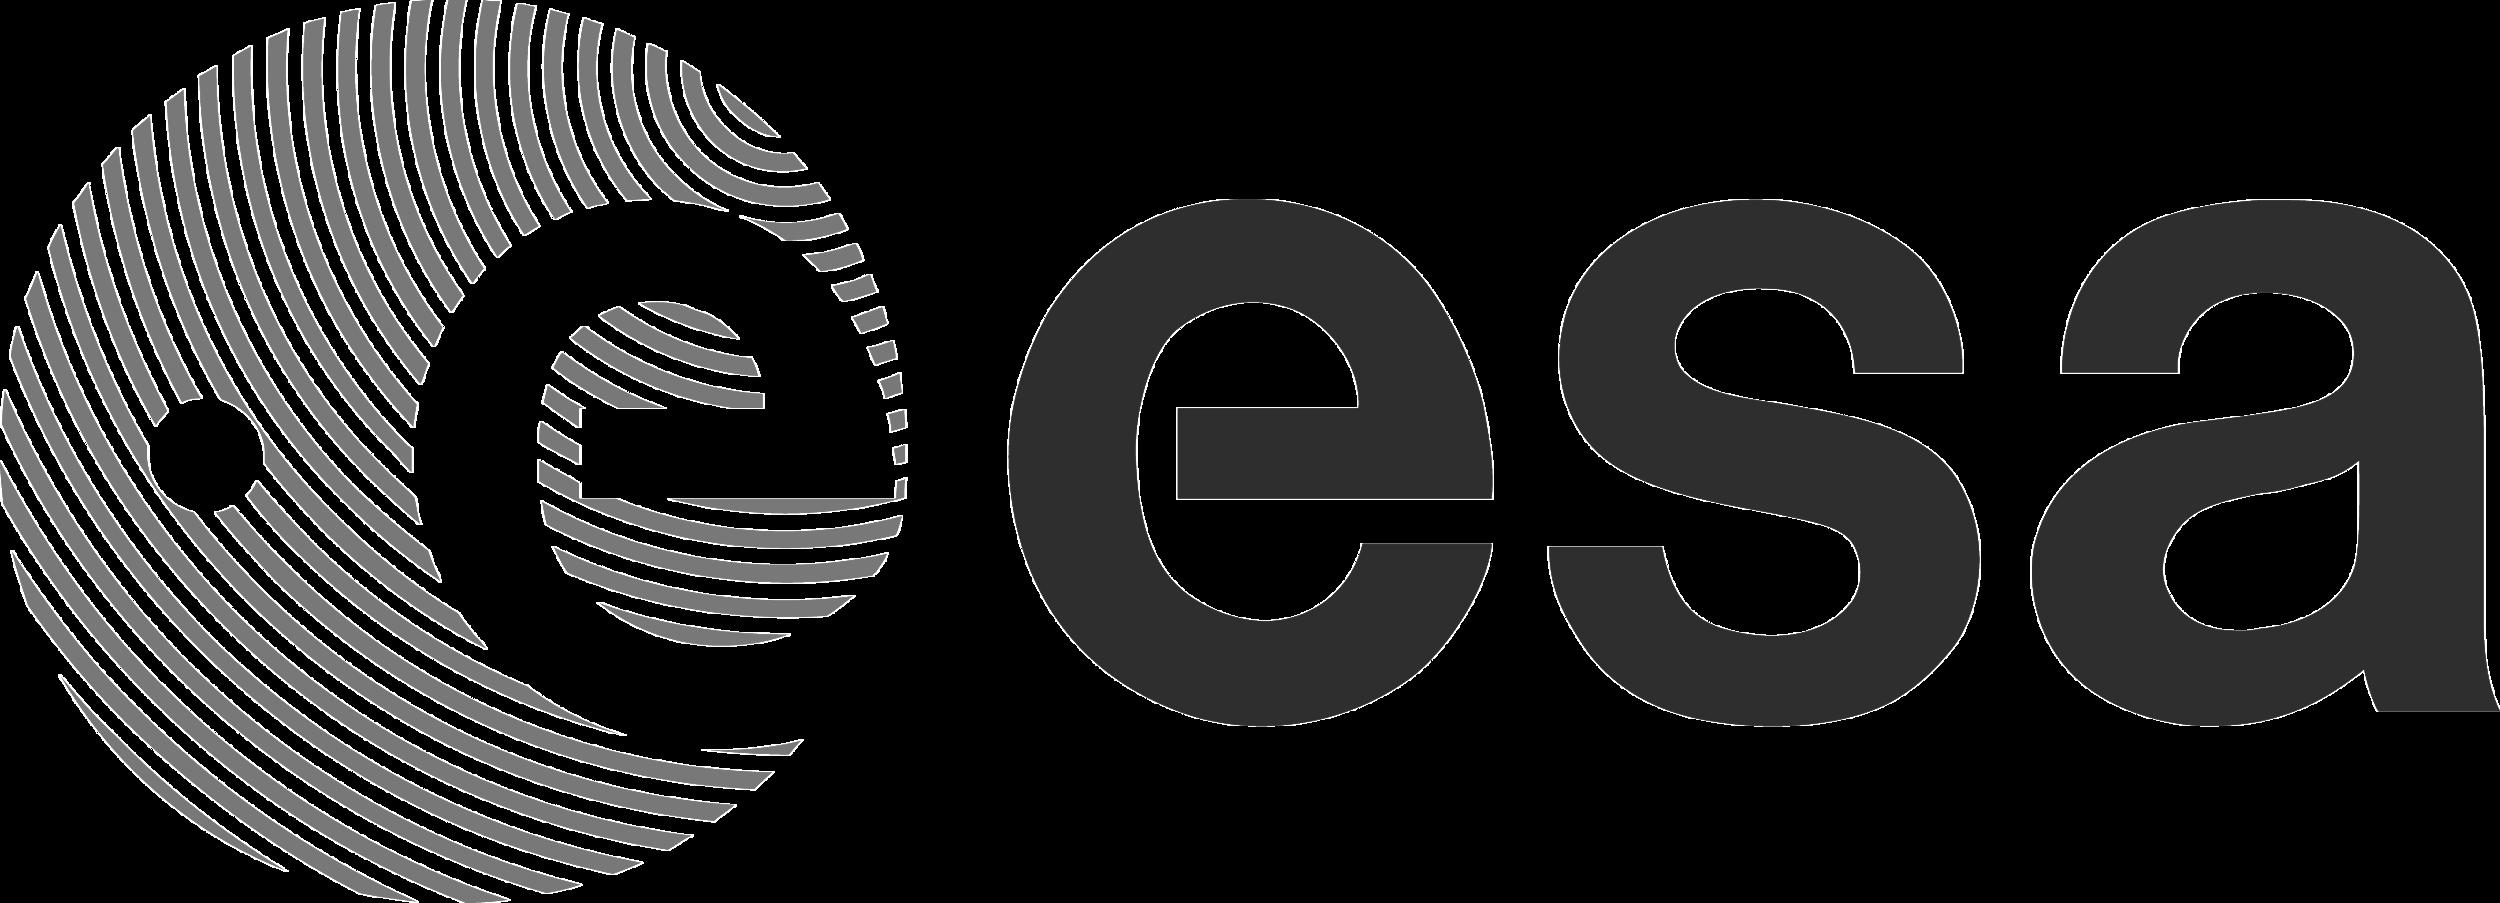 ESA greyscale.png